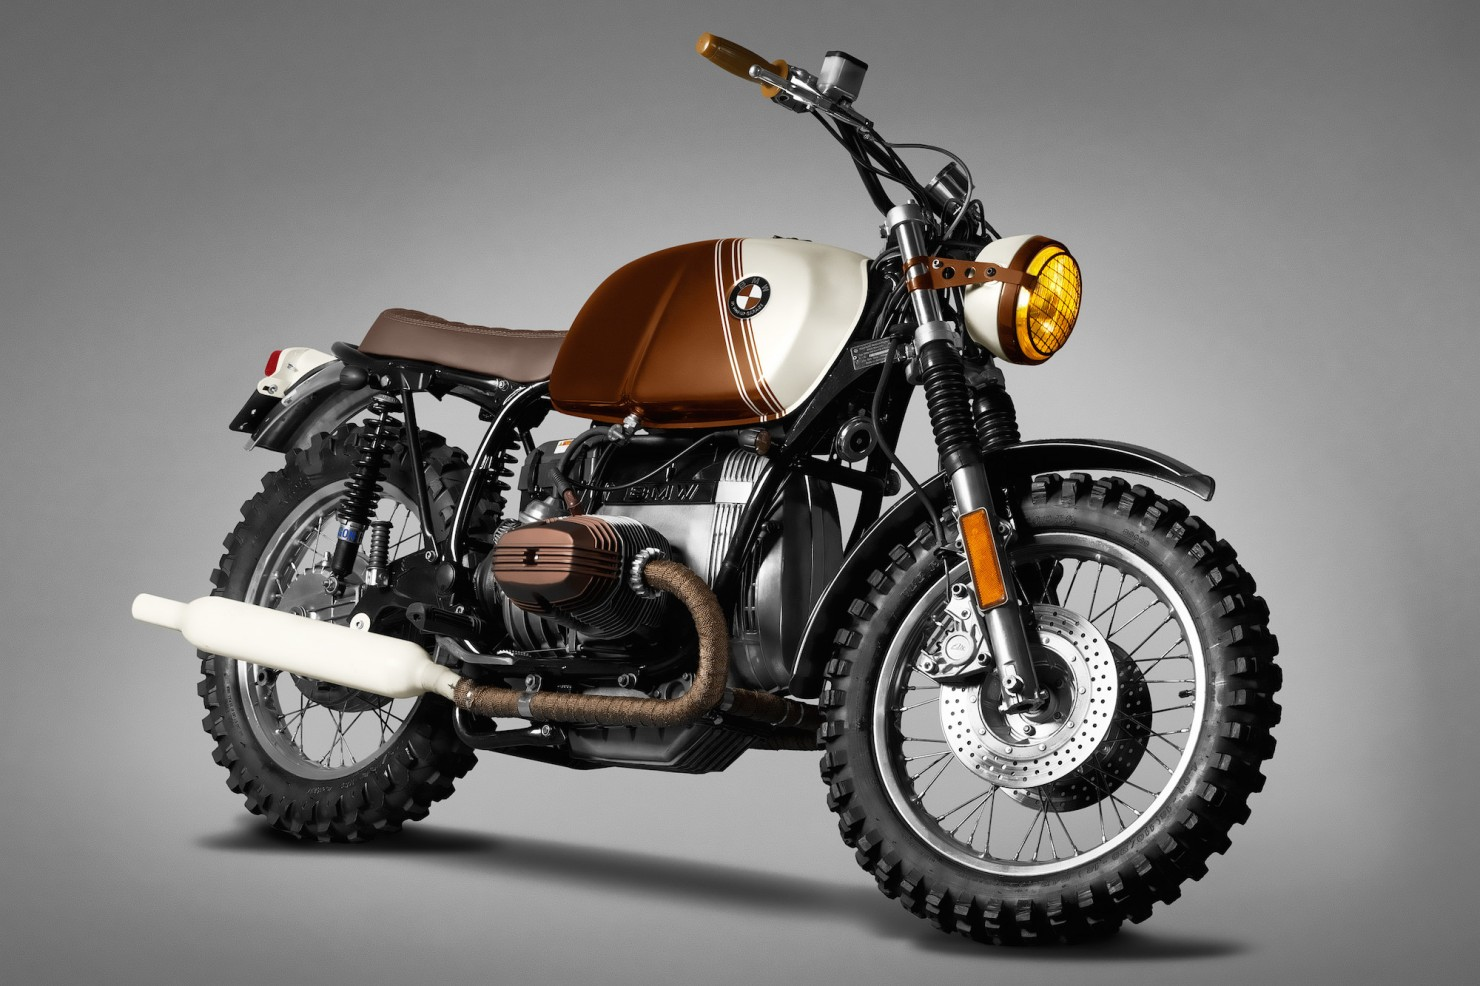 BMW R45 Custom Motorcycle 2